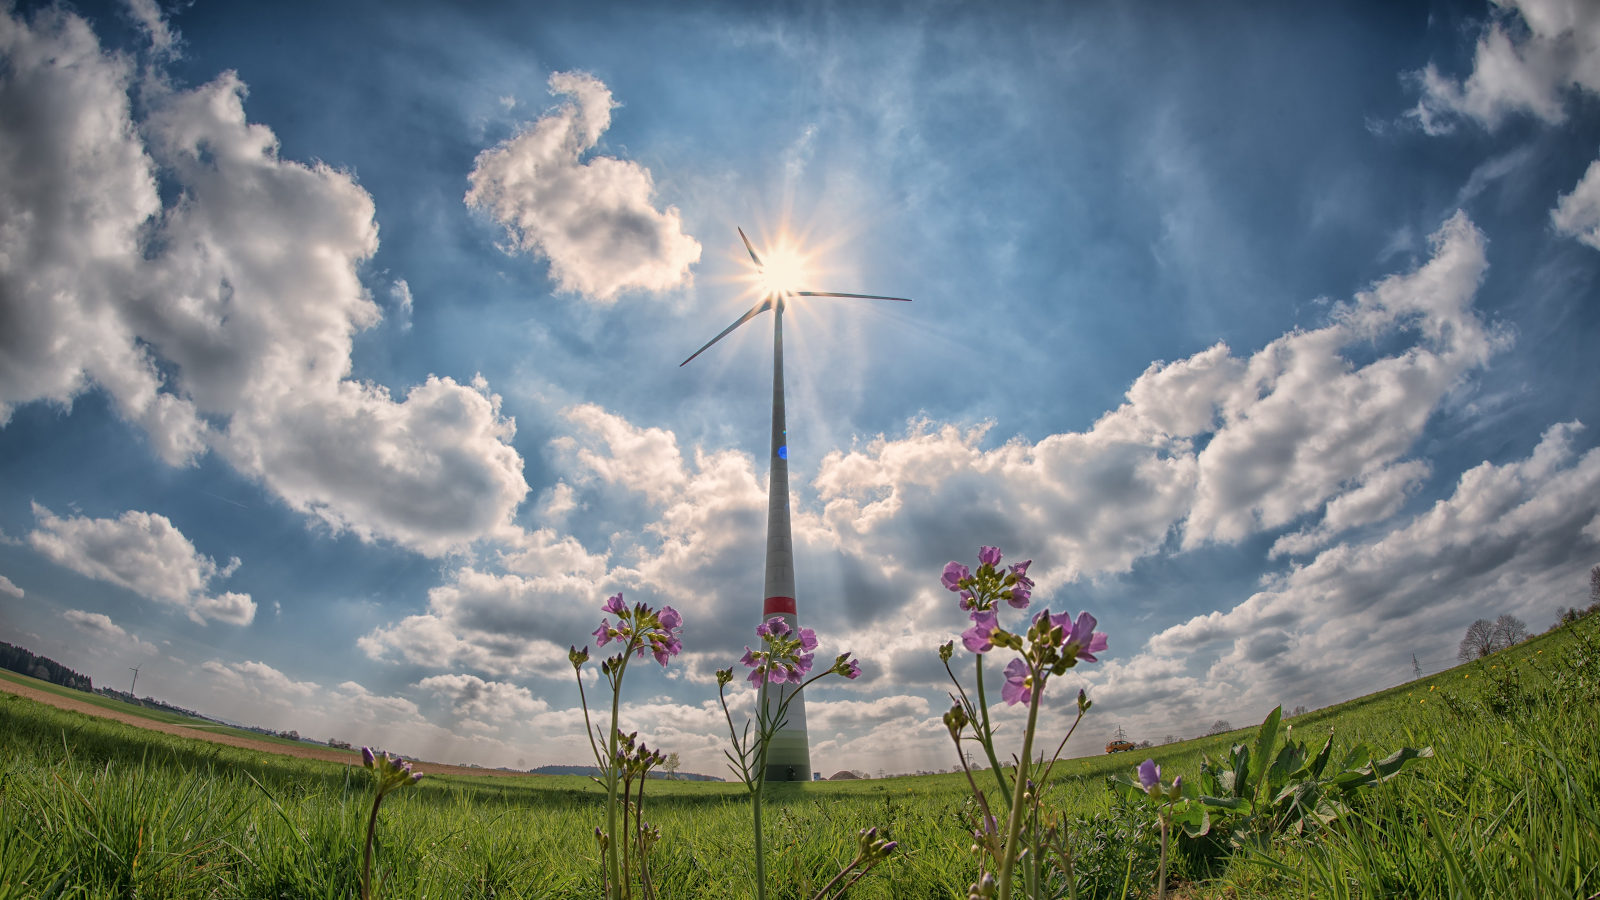 a wind turbine prototype towers into the sunny sky